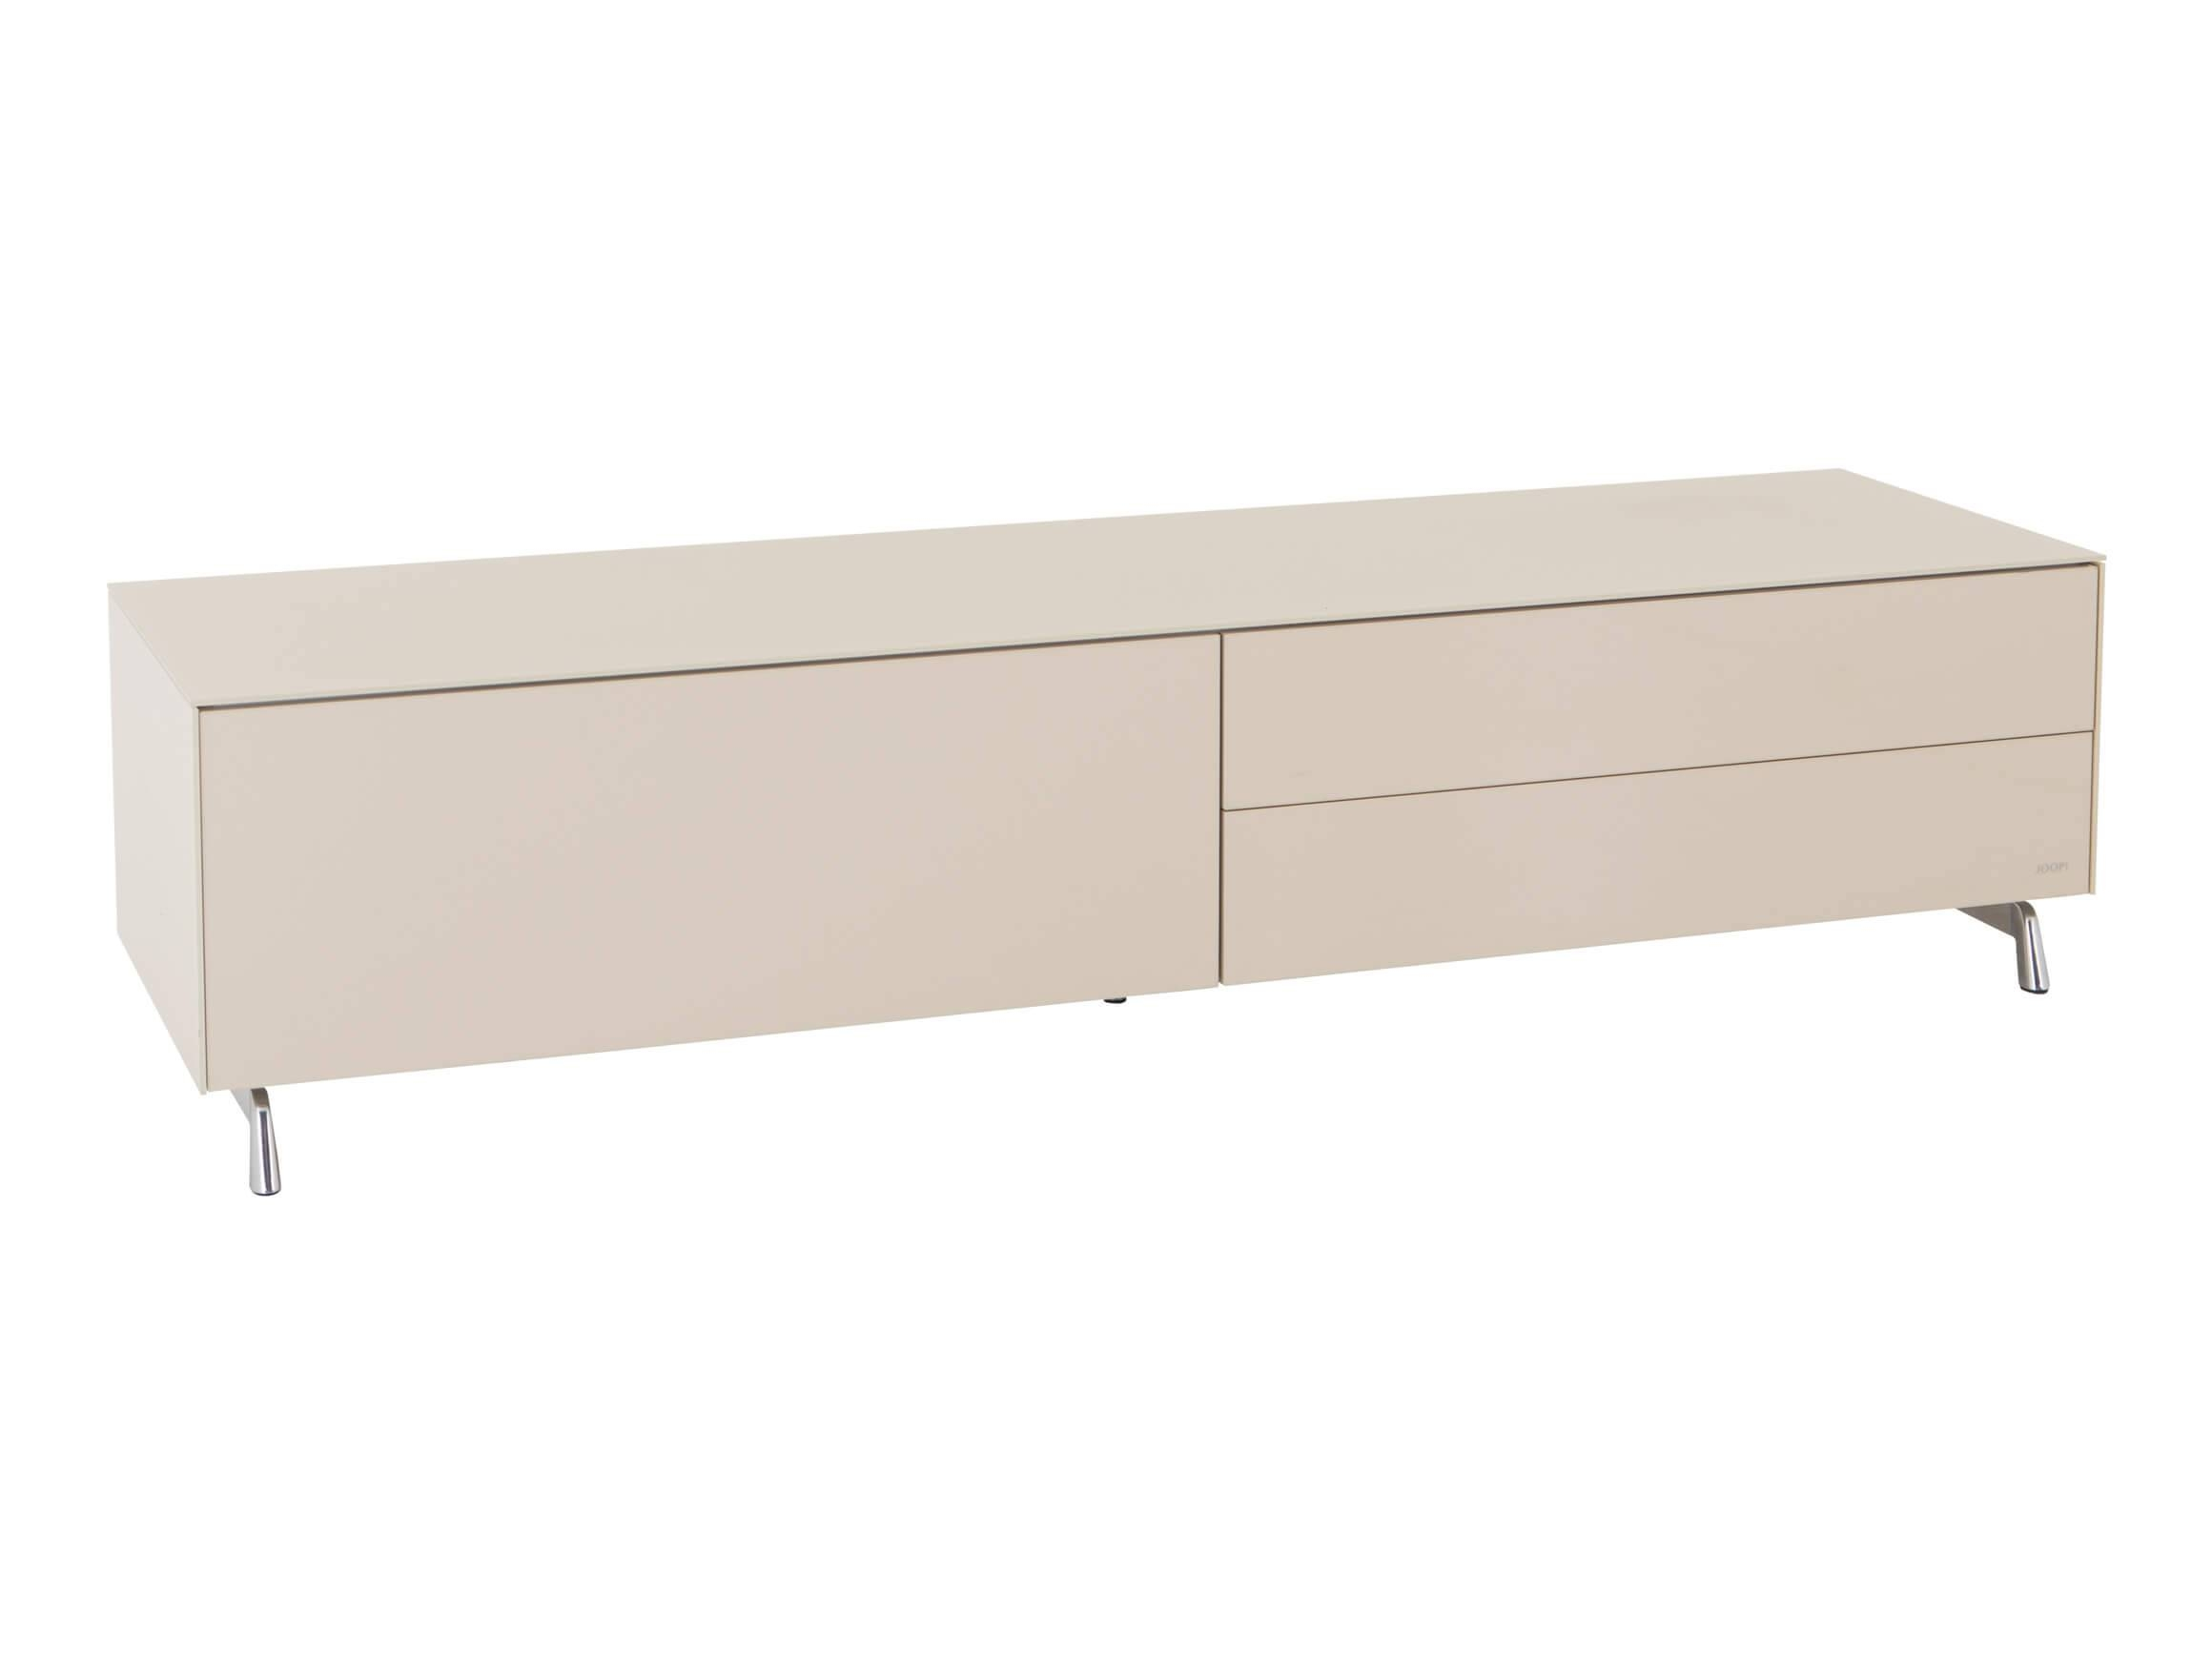 Lowboard Loft, 2 Schubladen, Beleuchtung, B 202 Cm H 47 Cm T 57 Cm regarding Joop Sideboards (Image 11 of 15)